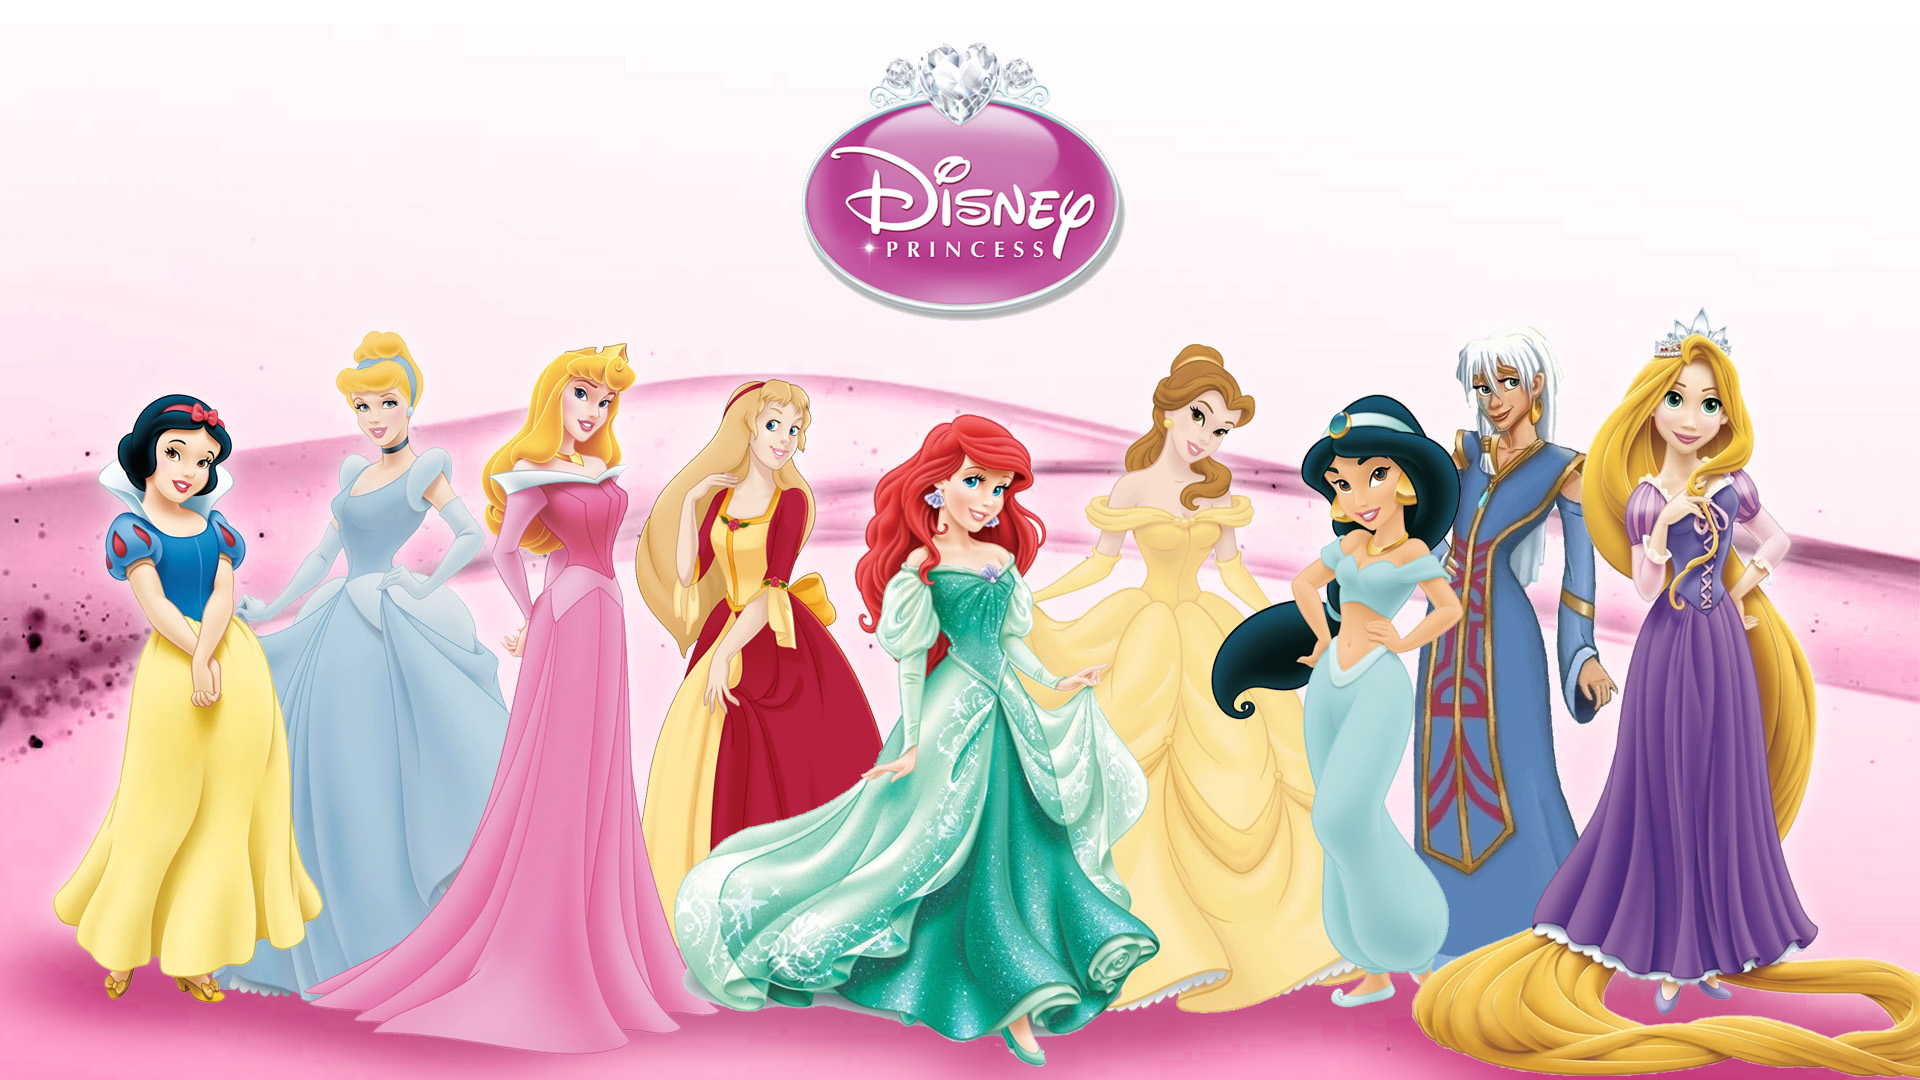 Princesas Disney Fondos Disney Princess Wallpapers HD Wallpapers Download Free Images Wallpaper [1000image.com]